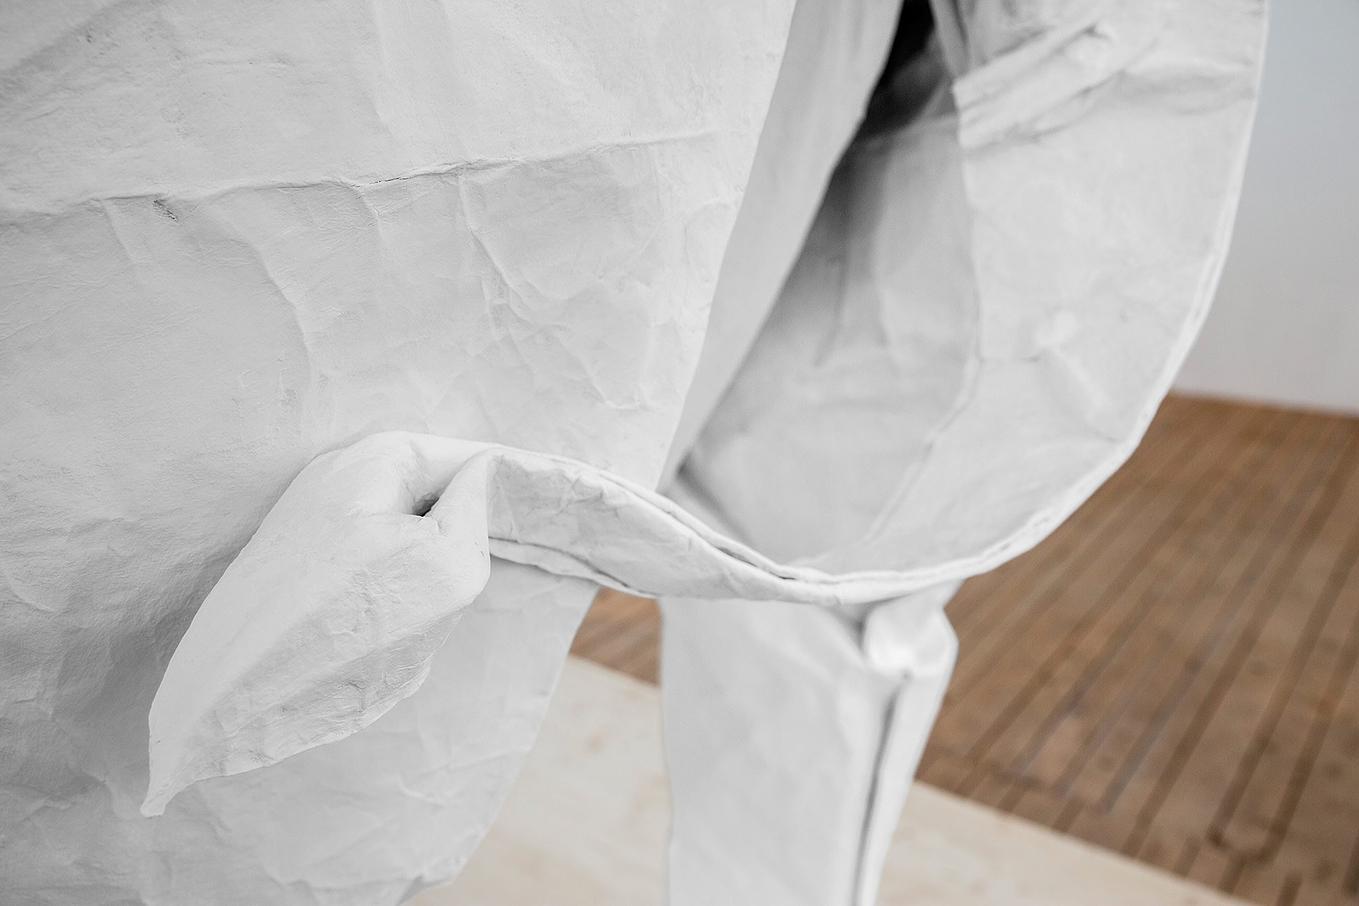 life-size-origami-elephant-by-sipho-mabona-gessato-3